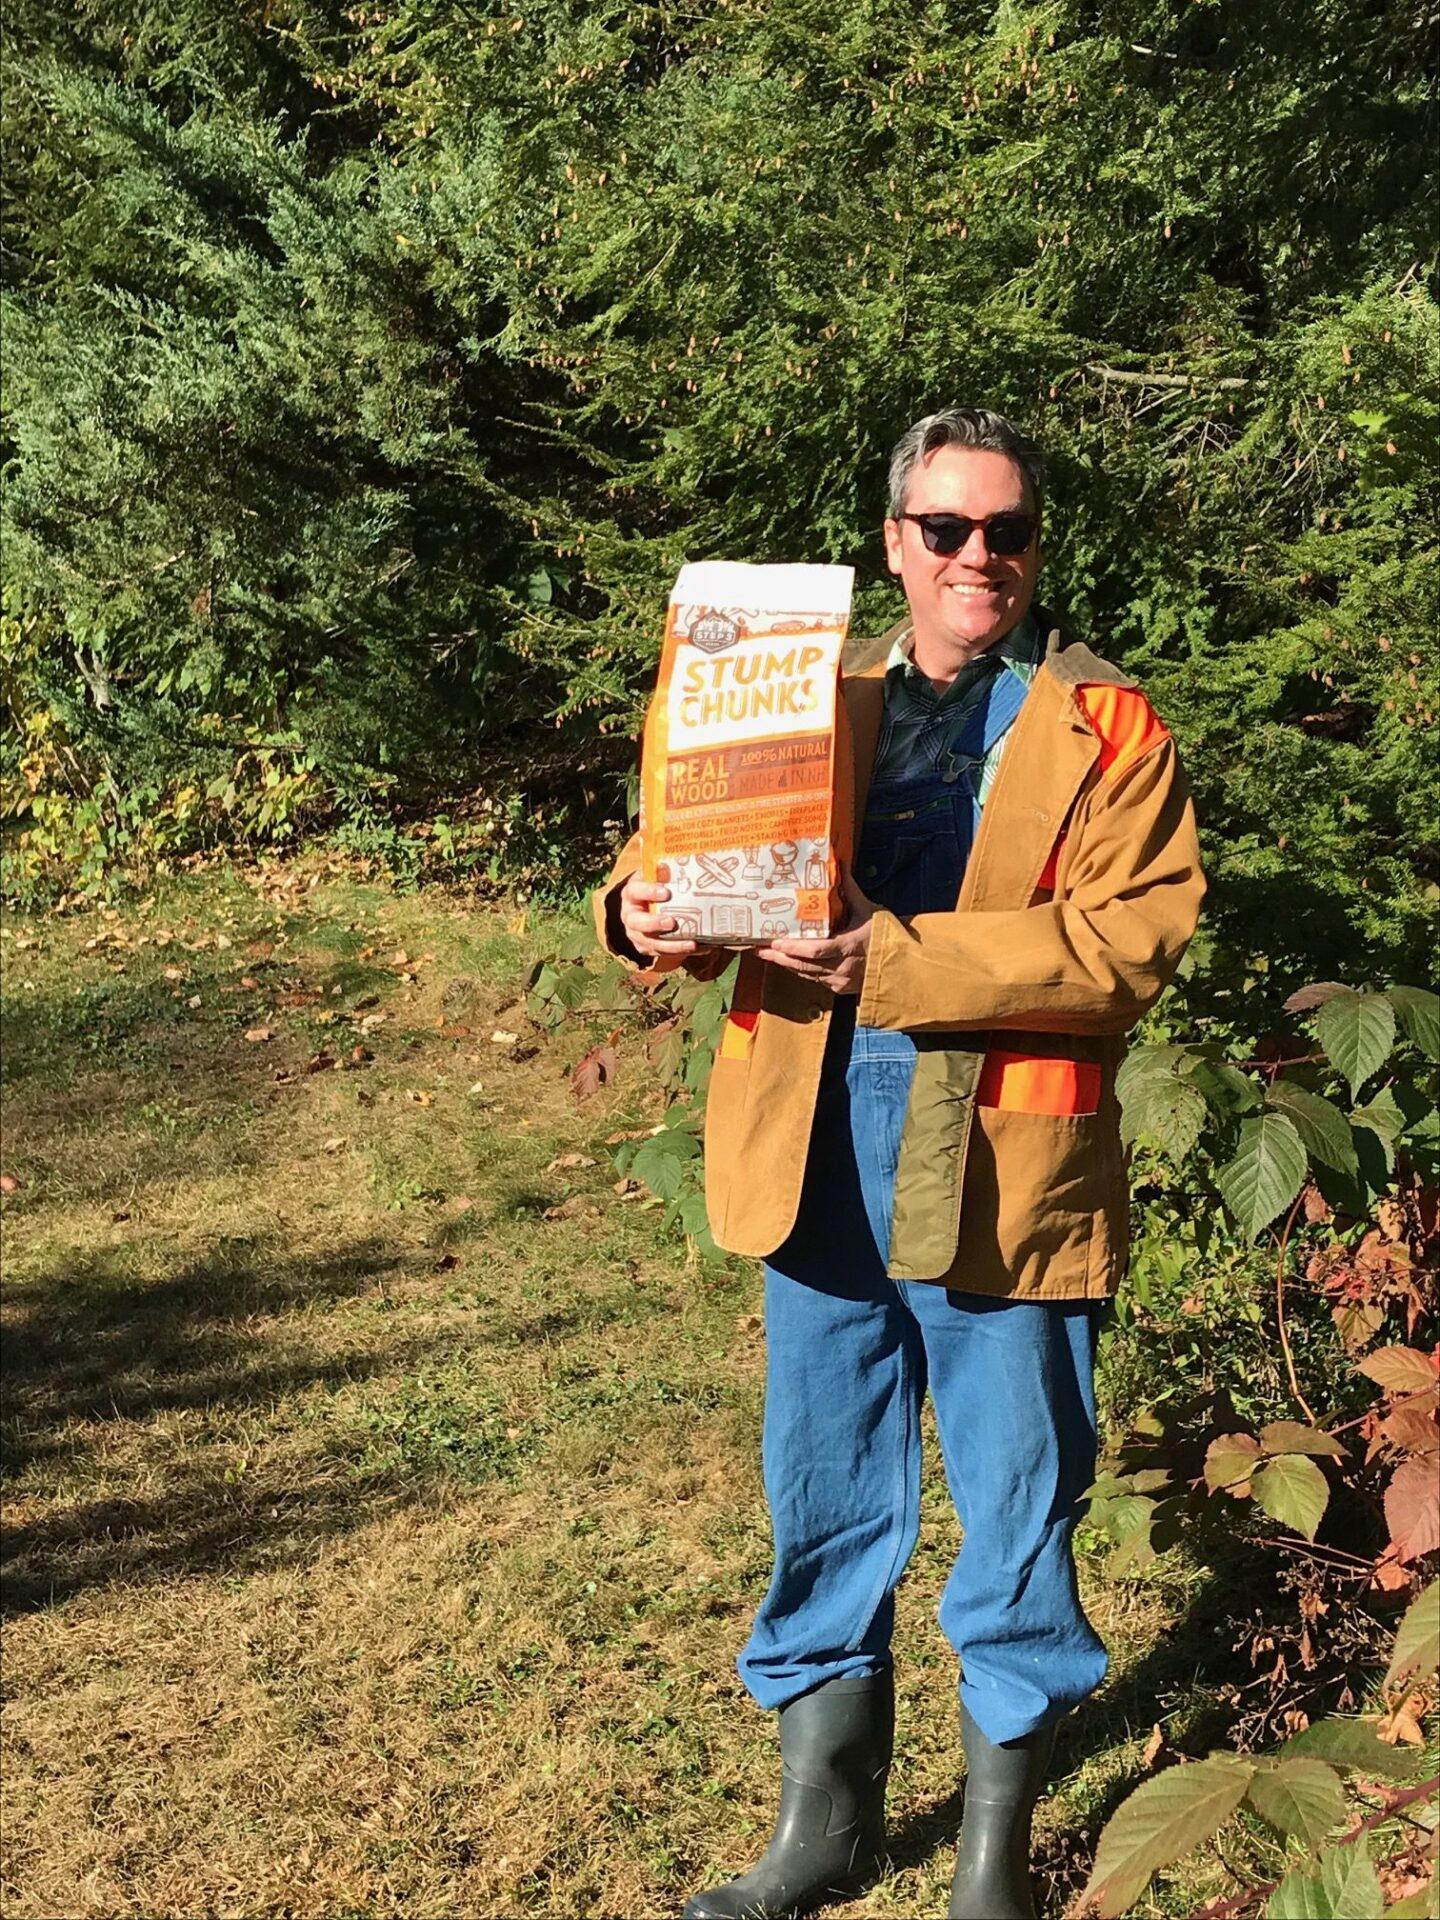 Stump Chunks – August 2017 – Large Bag Contest Winner